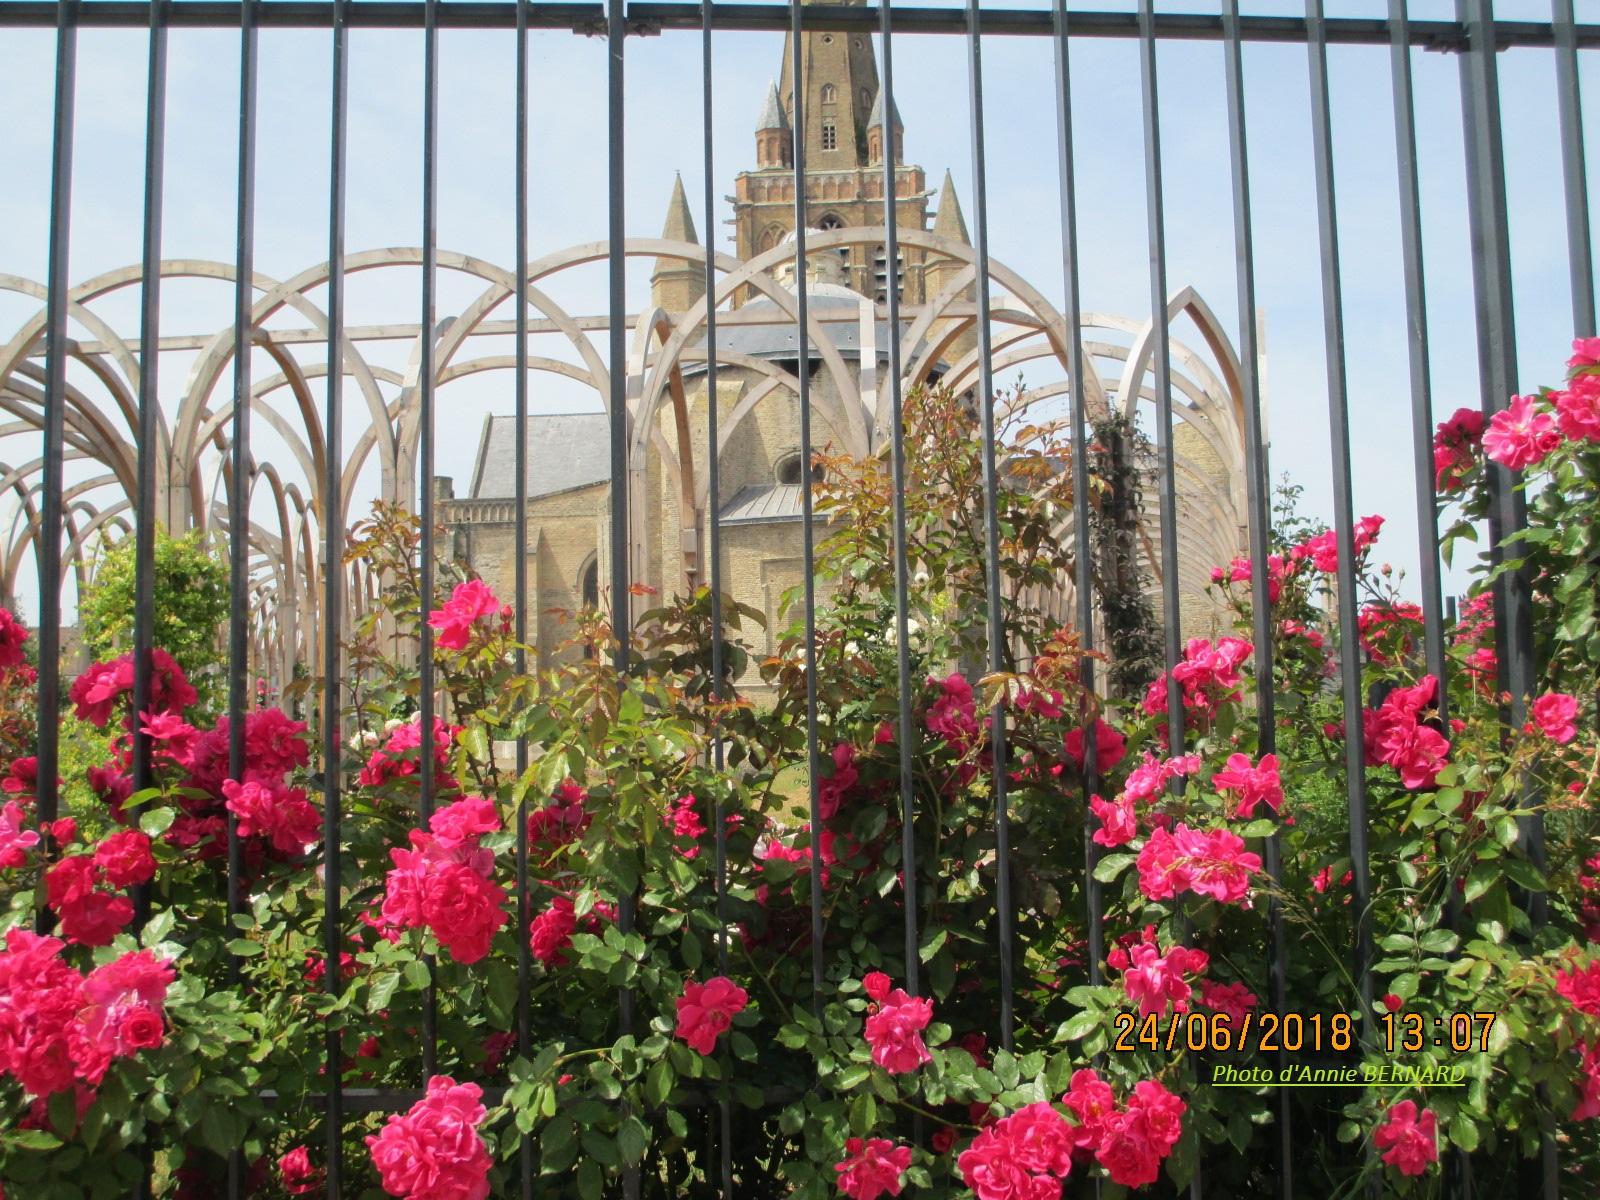 Rosiers à Notre-Dame